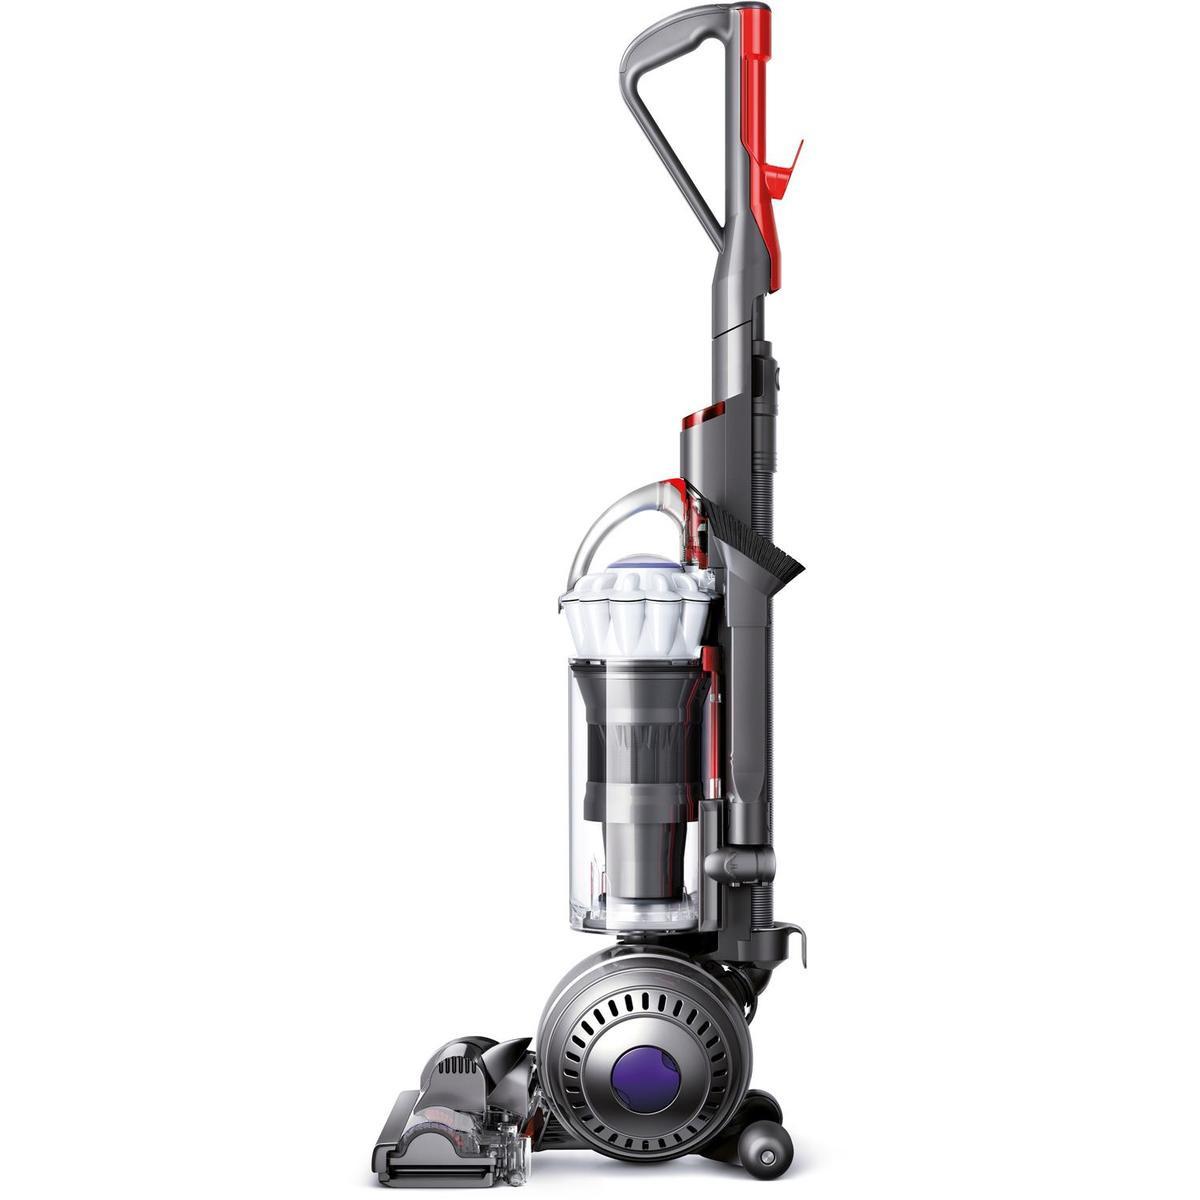 vacuum broom for hardwood floors of dyson ball up16 multi floor vacuum cleaner big w with regard to dyson ball up16 multi floor vacuum cleaner